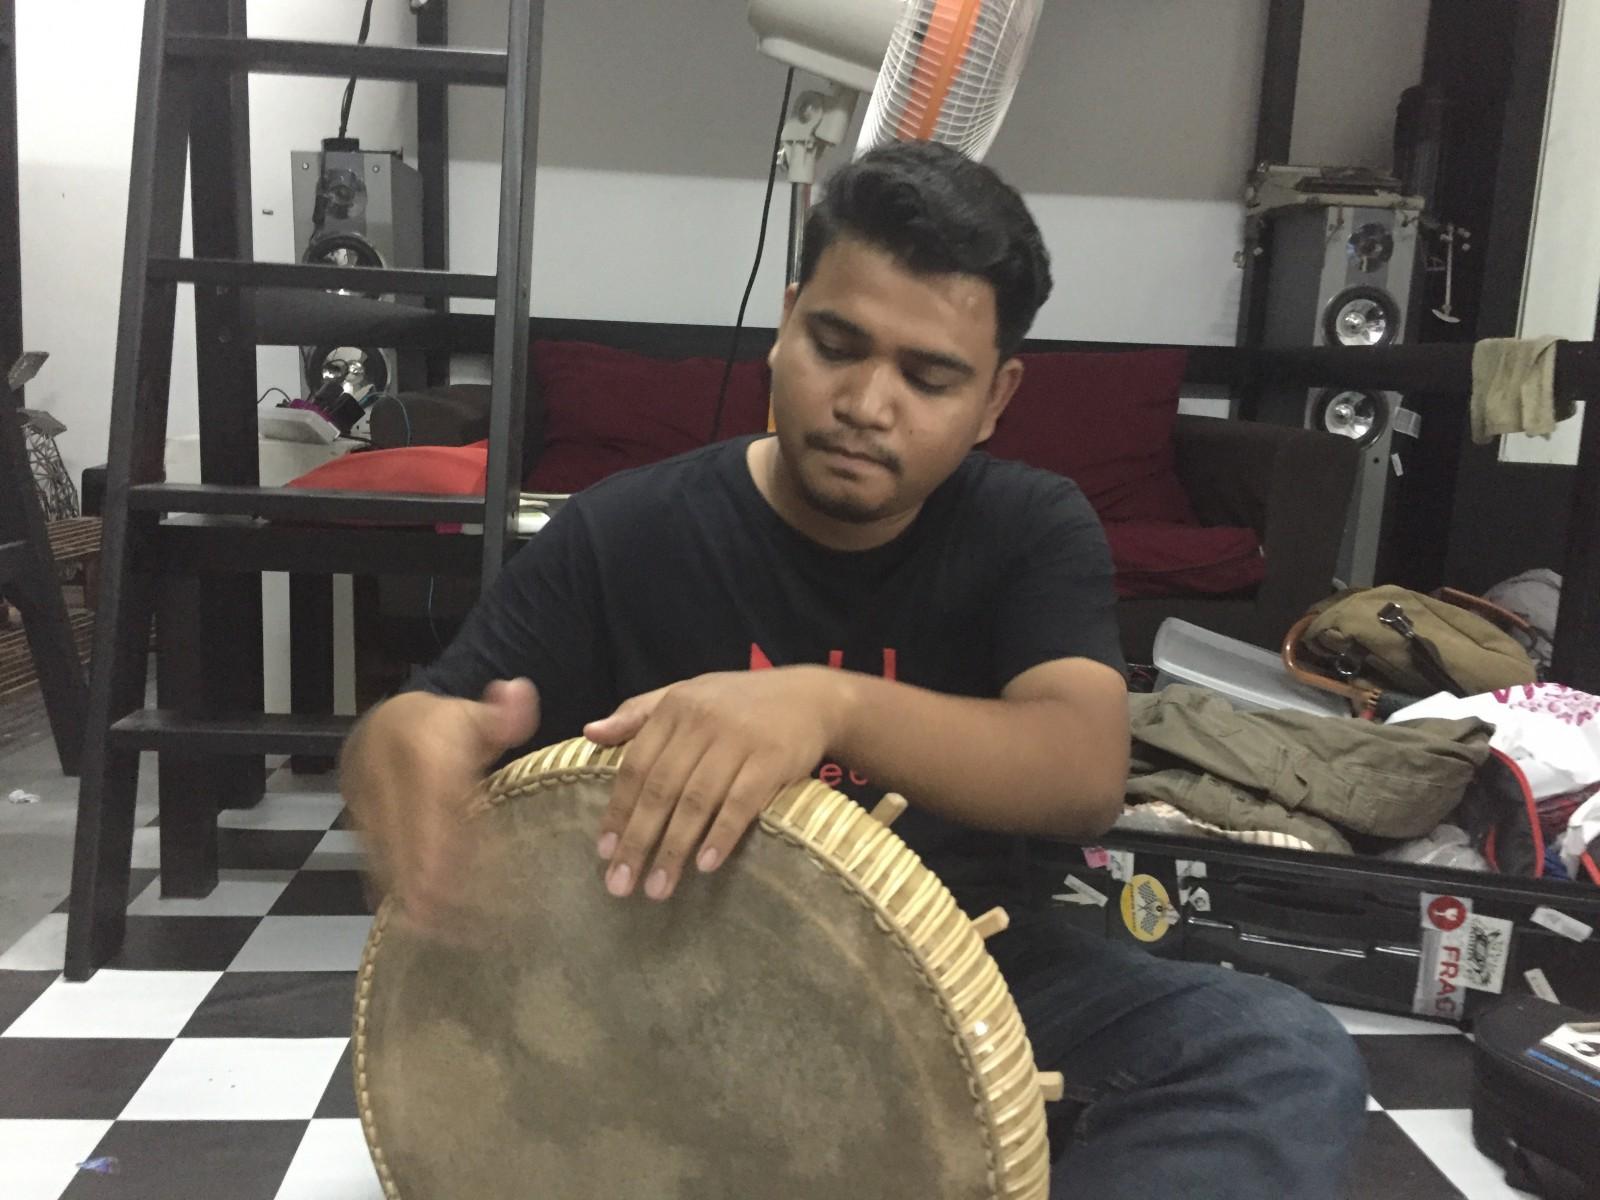 Wardi Nazir from Kelantan, Malaysia